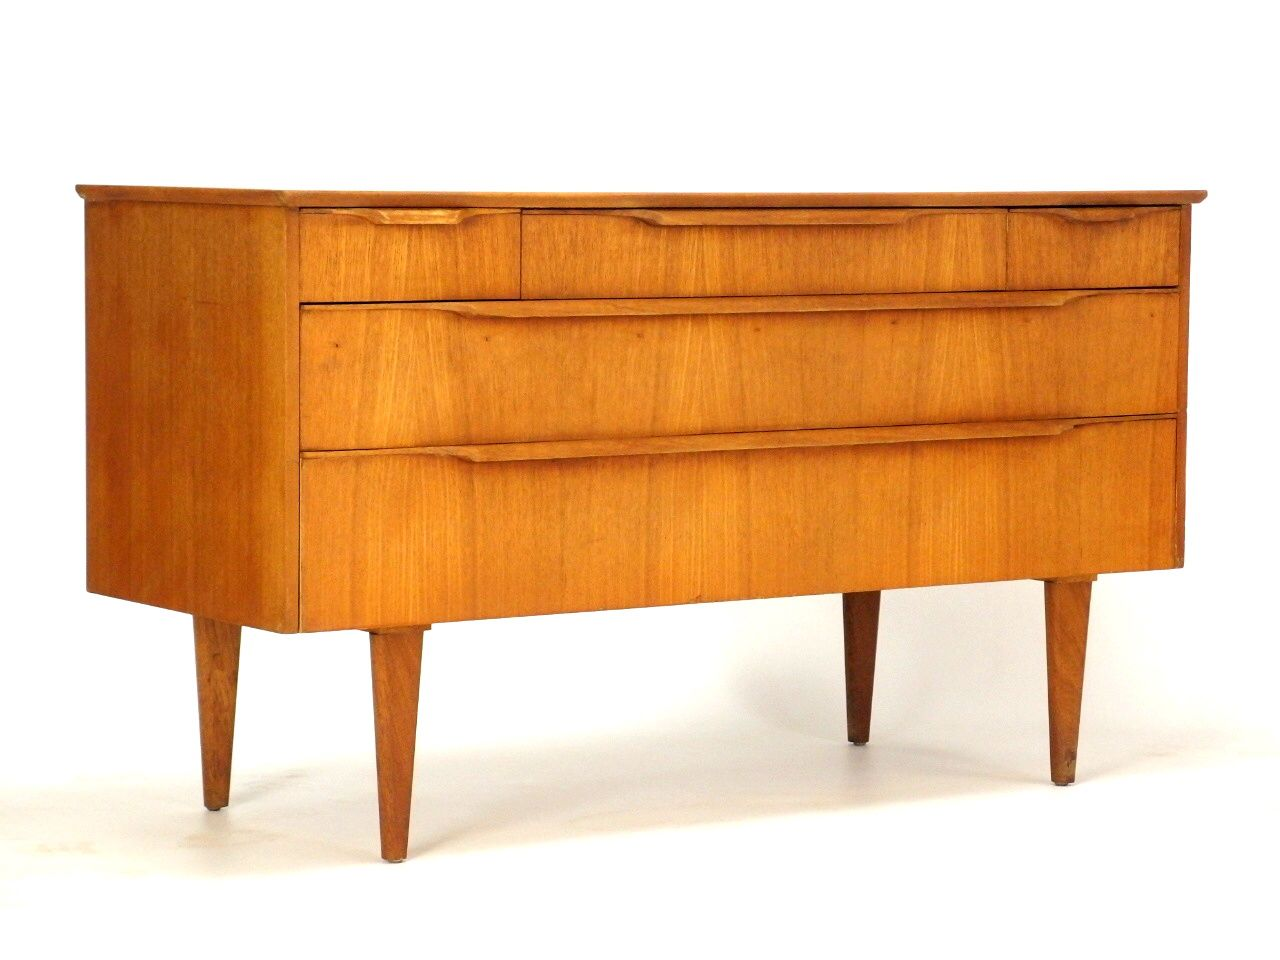 Sold prachtig vintage dressoir de minimalistische